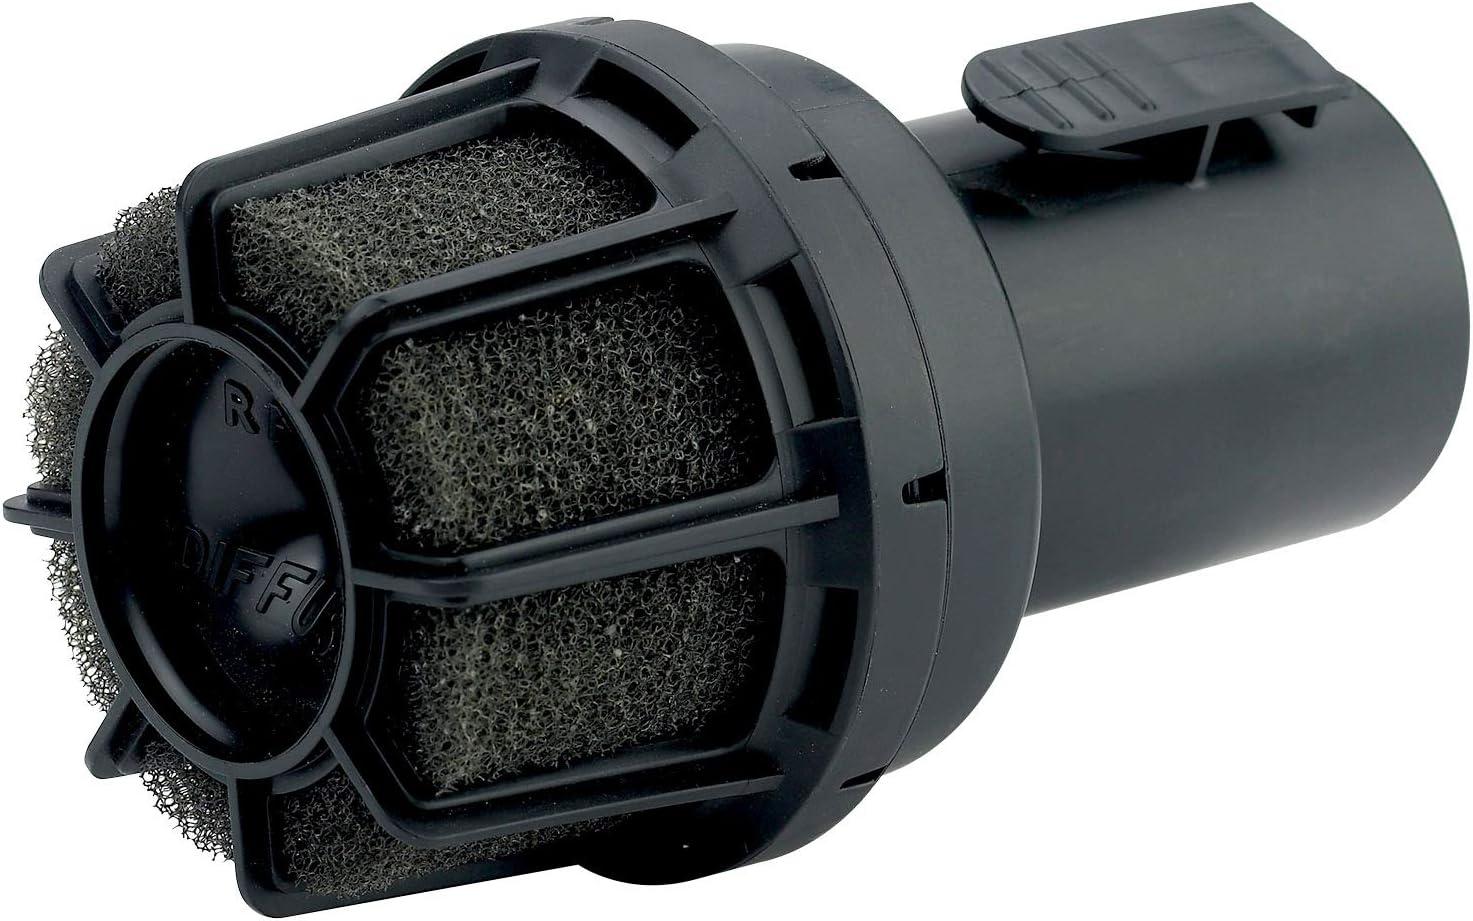 Craftsman CMXZVBE38660 2-1/2 in. Muffler Diffuser Wet/Dry Vac Attachment